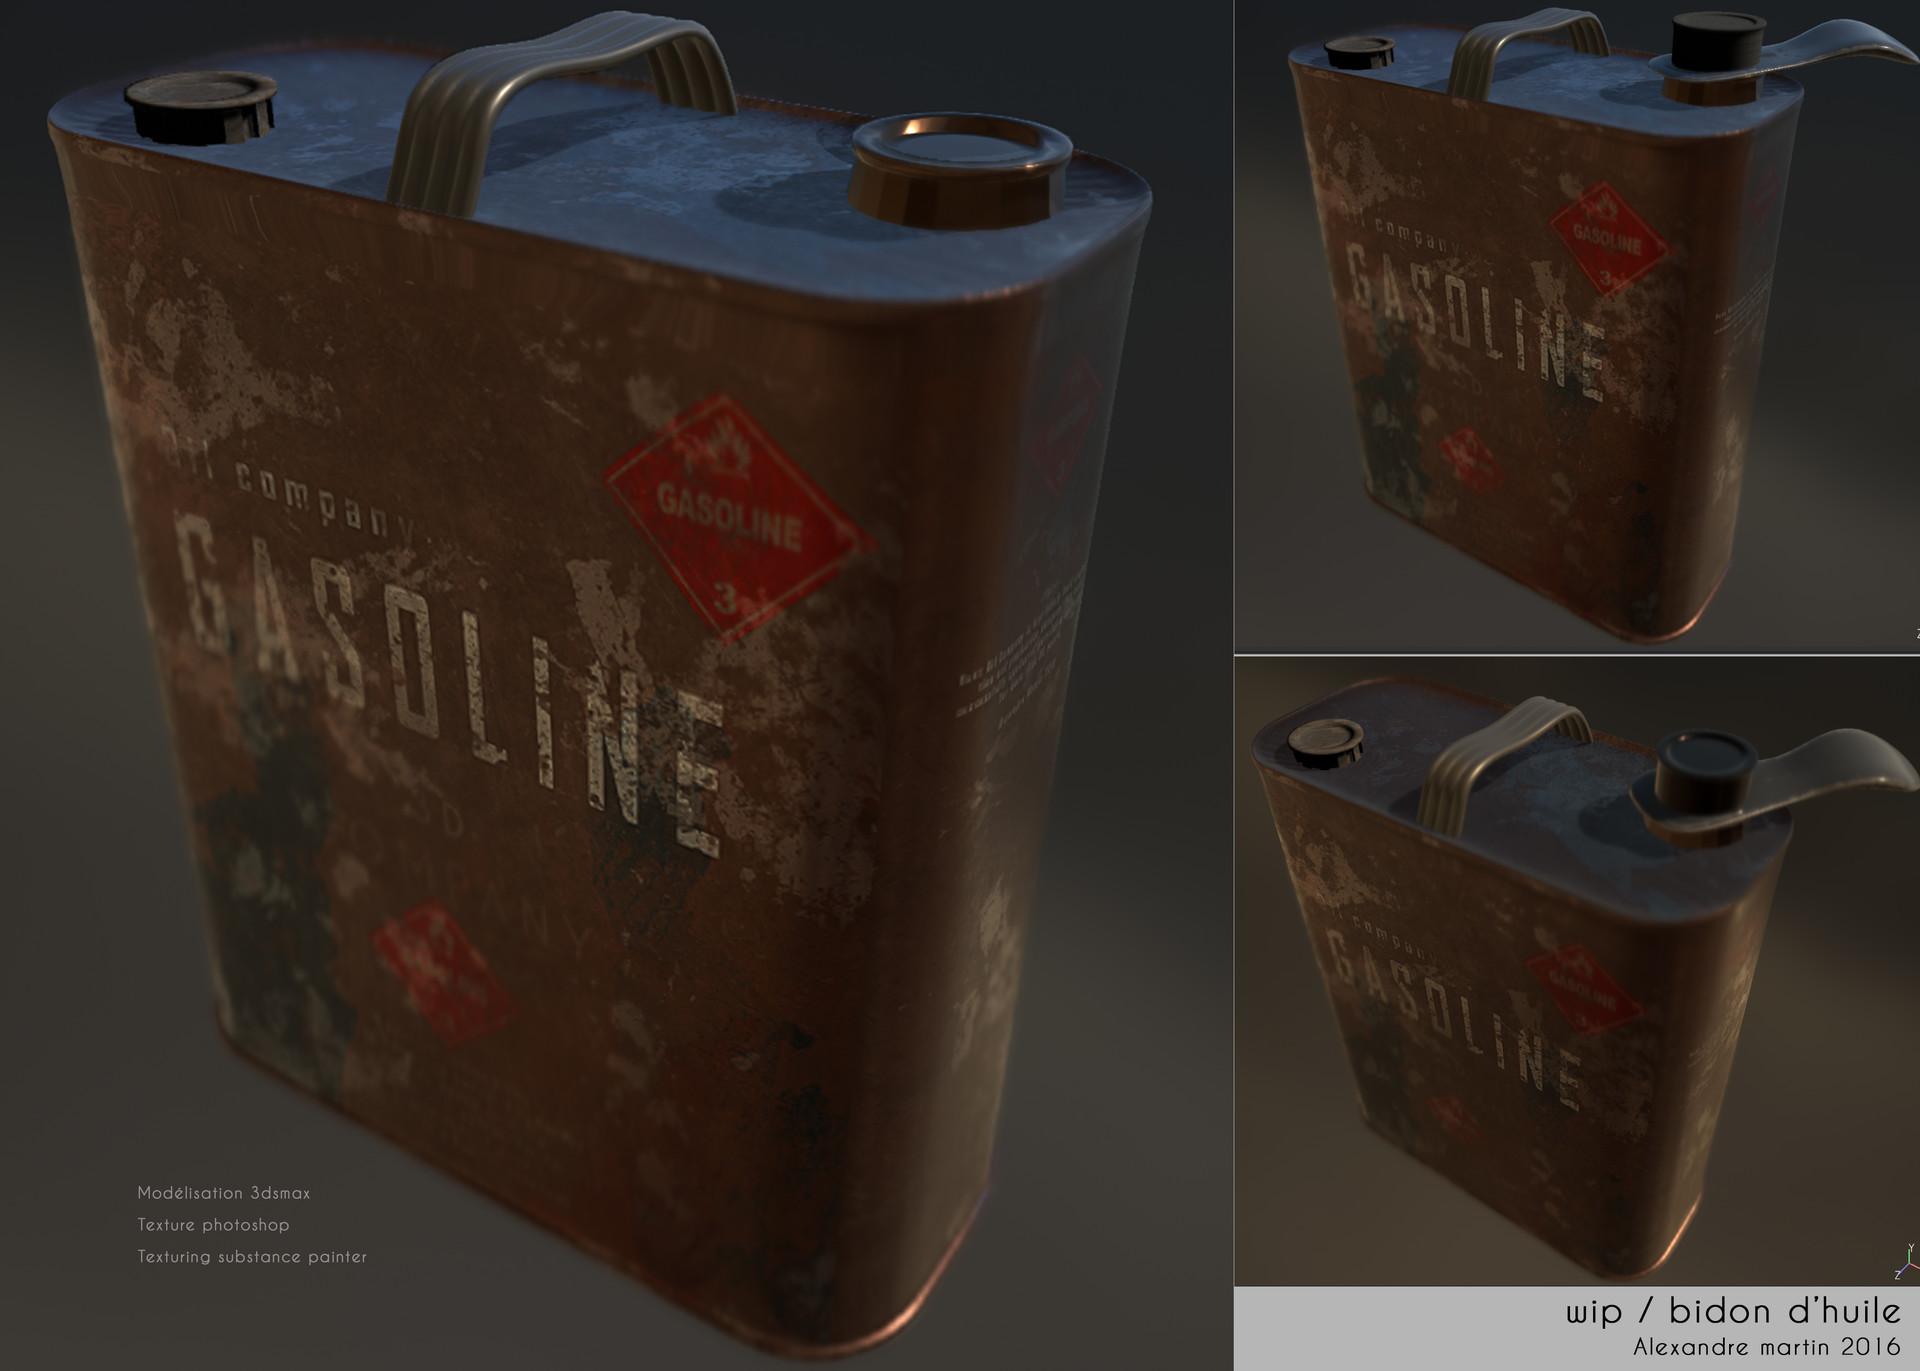 ArtStation - Gasoline 3dsmax, texture photoshop, render substance